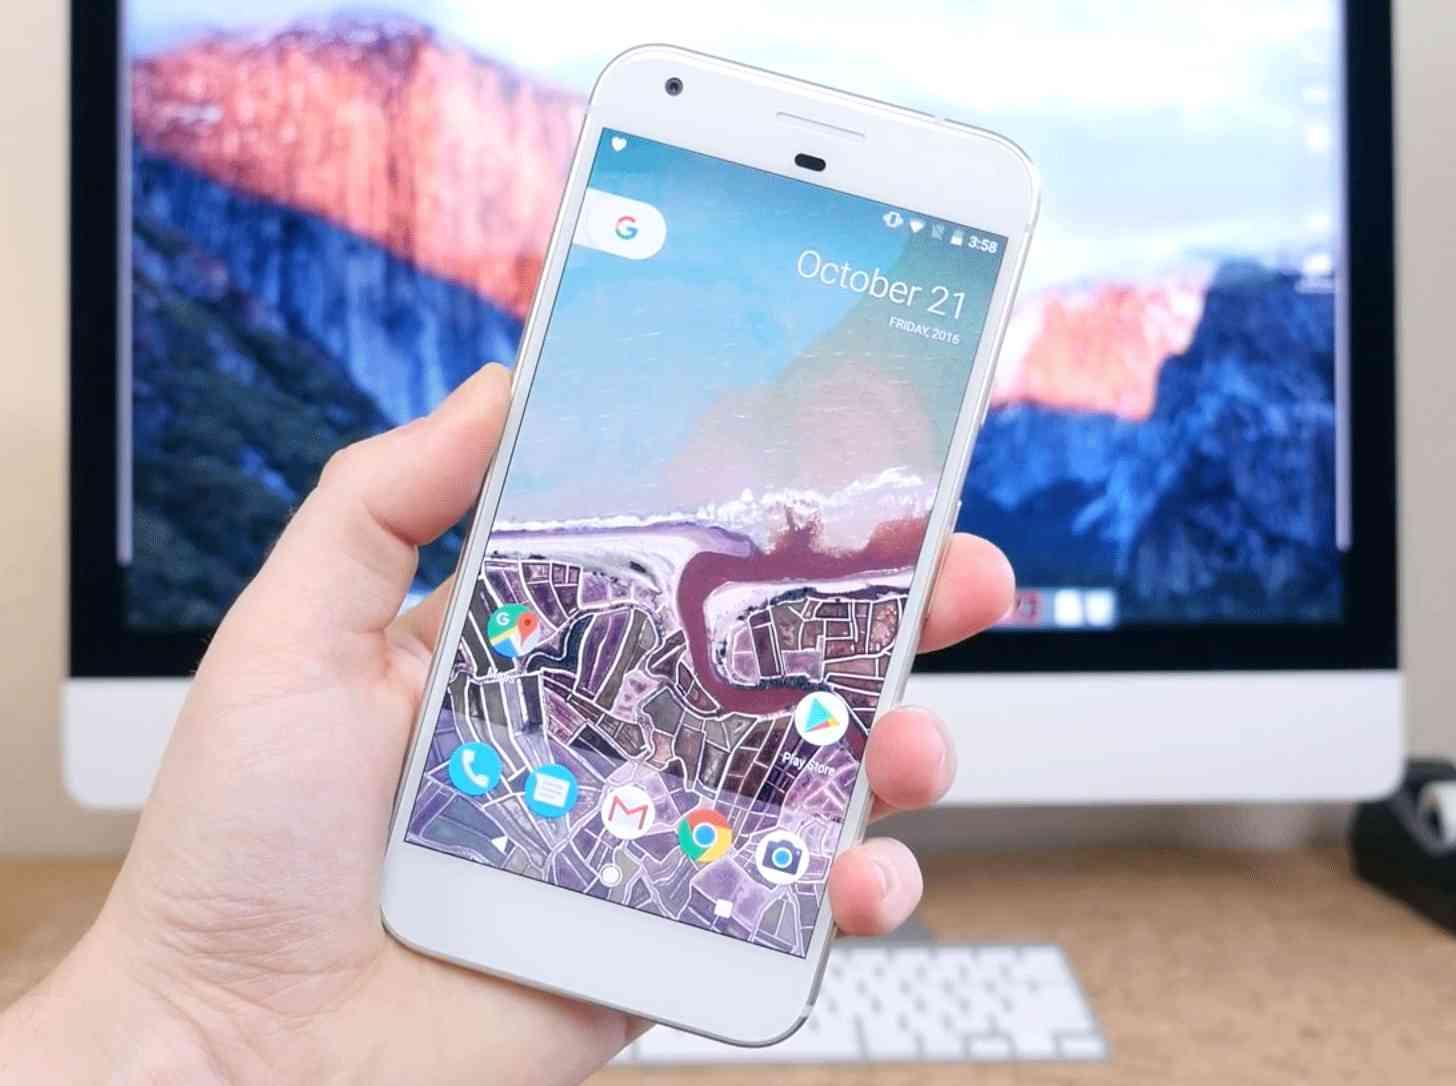 Google Pixel XL hands-on video